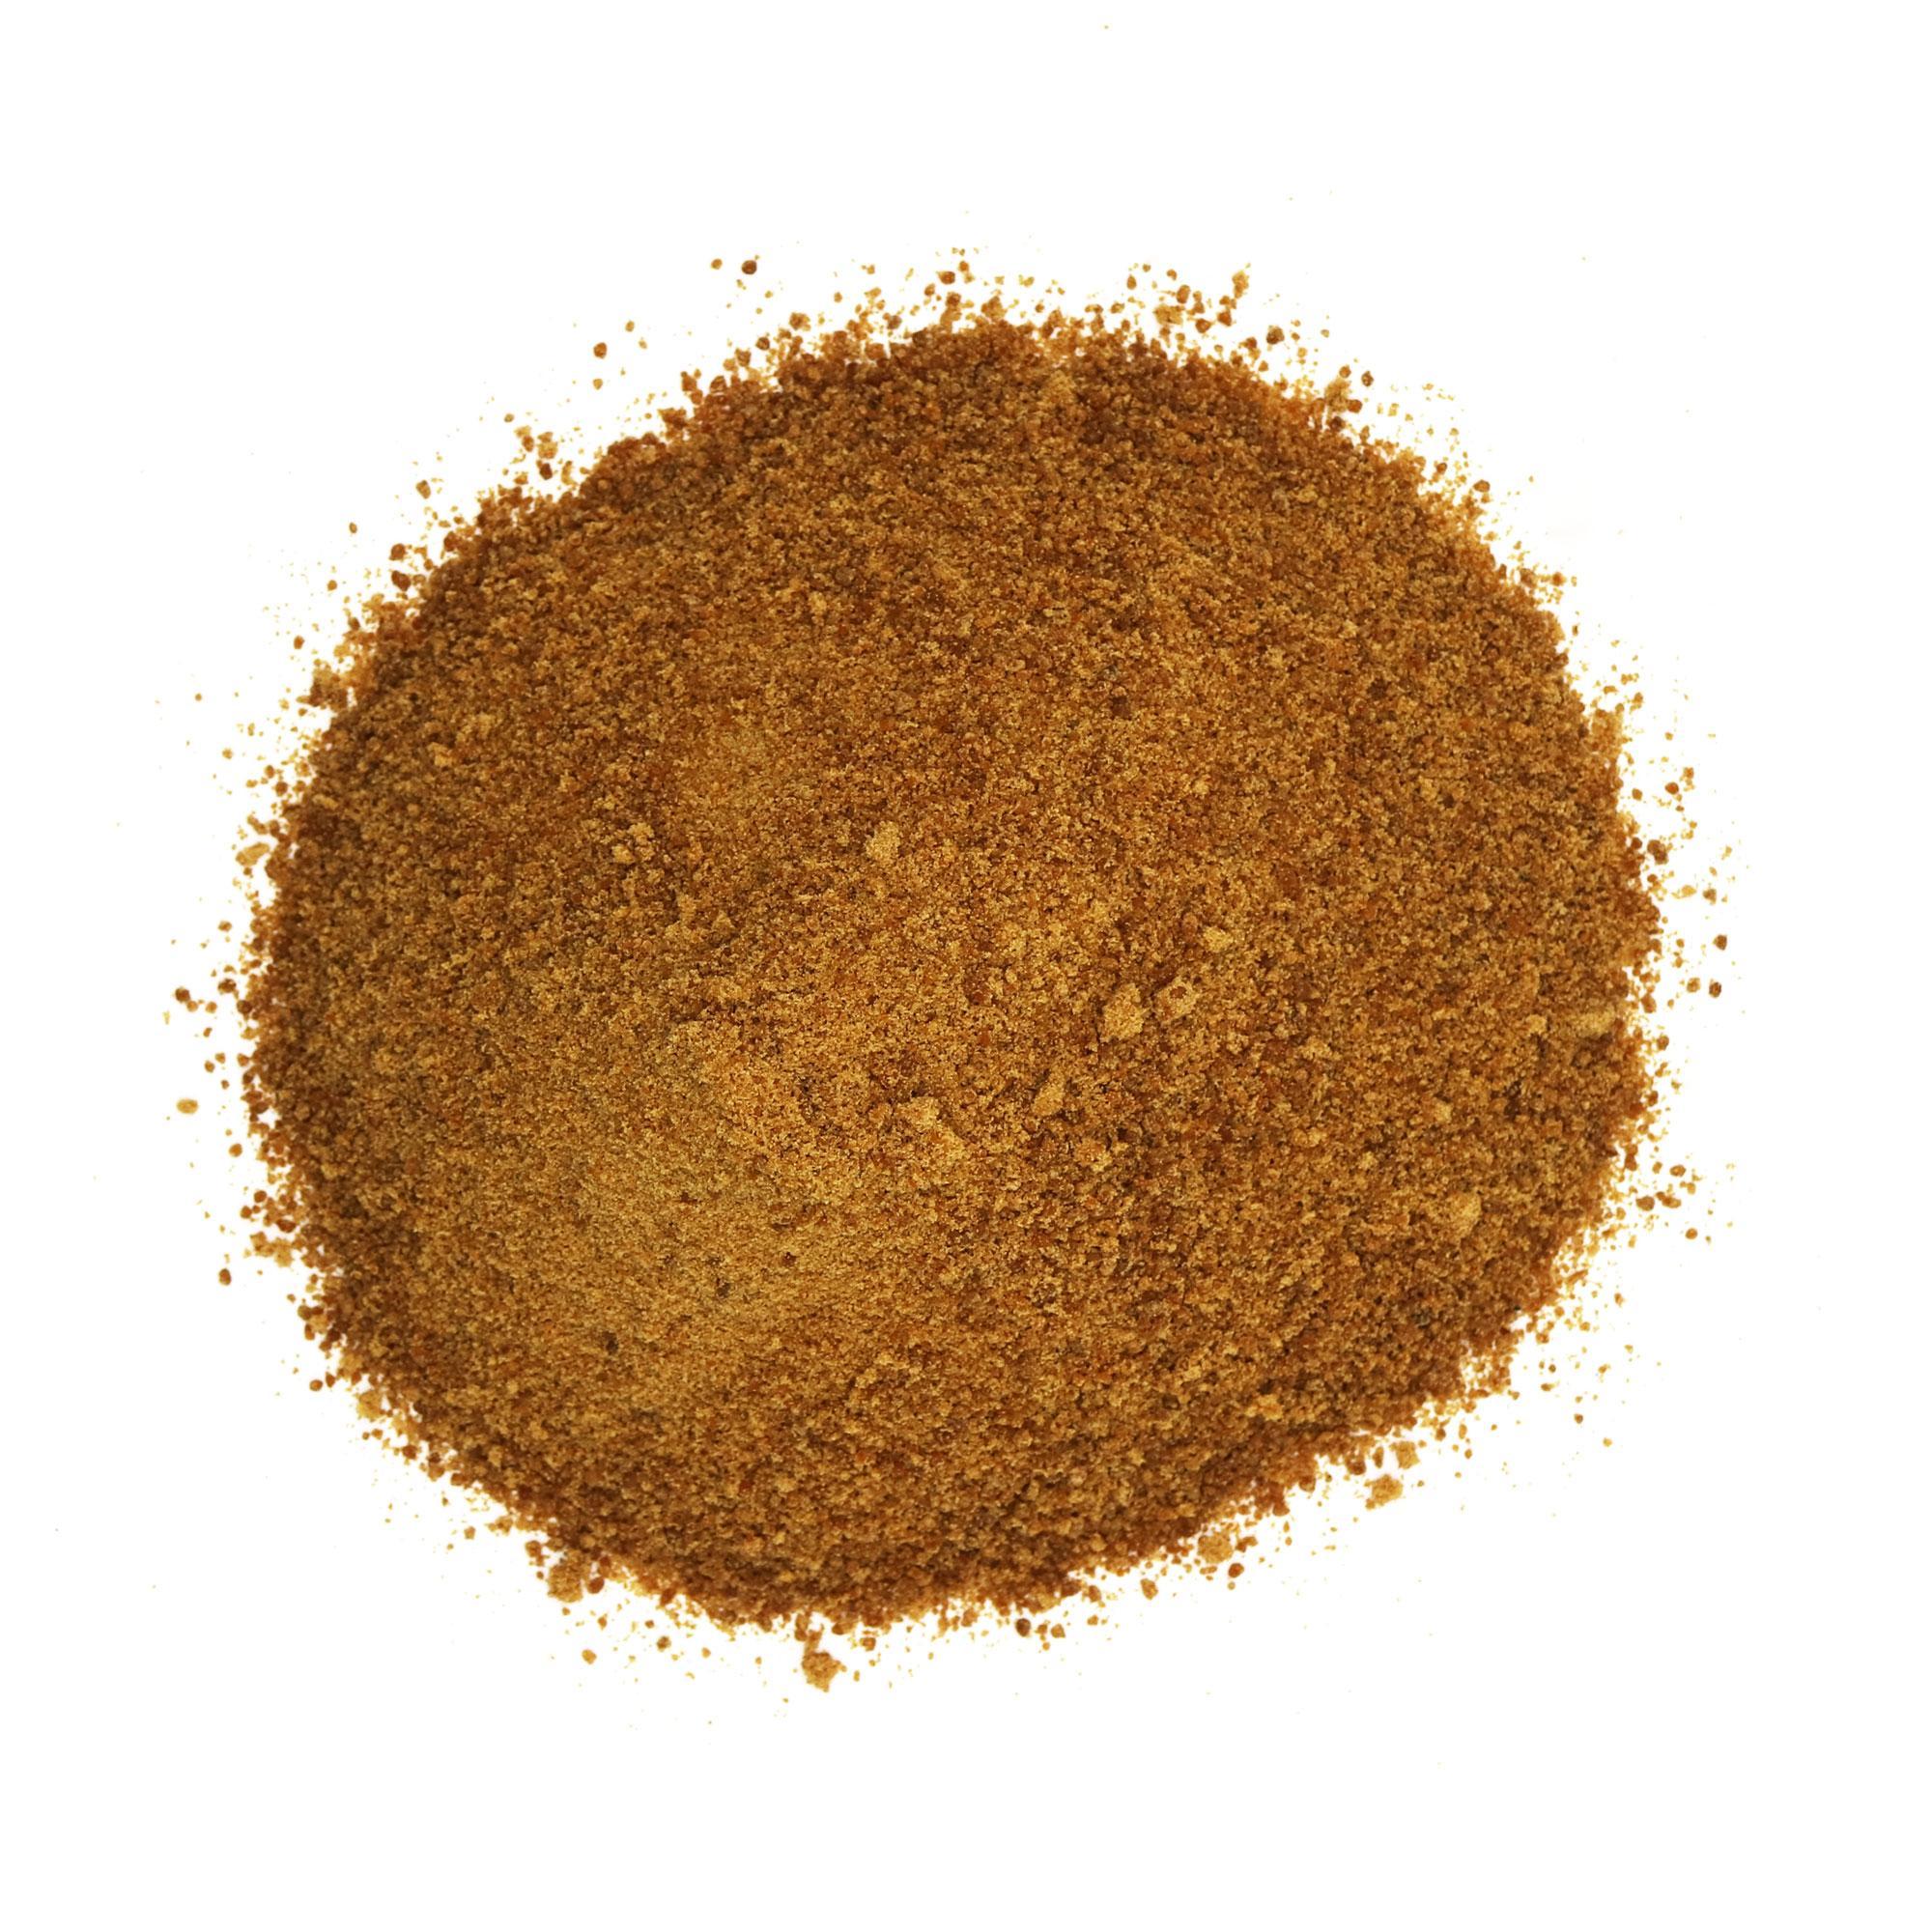 img-vrac-1kg-de-sucre-de-coco-en-vrac-bio